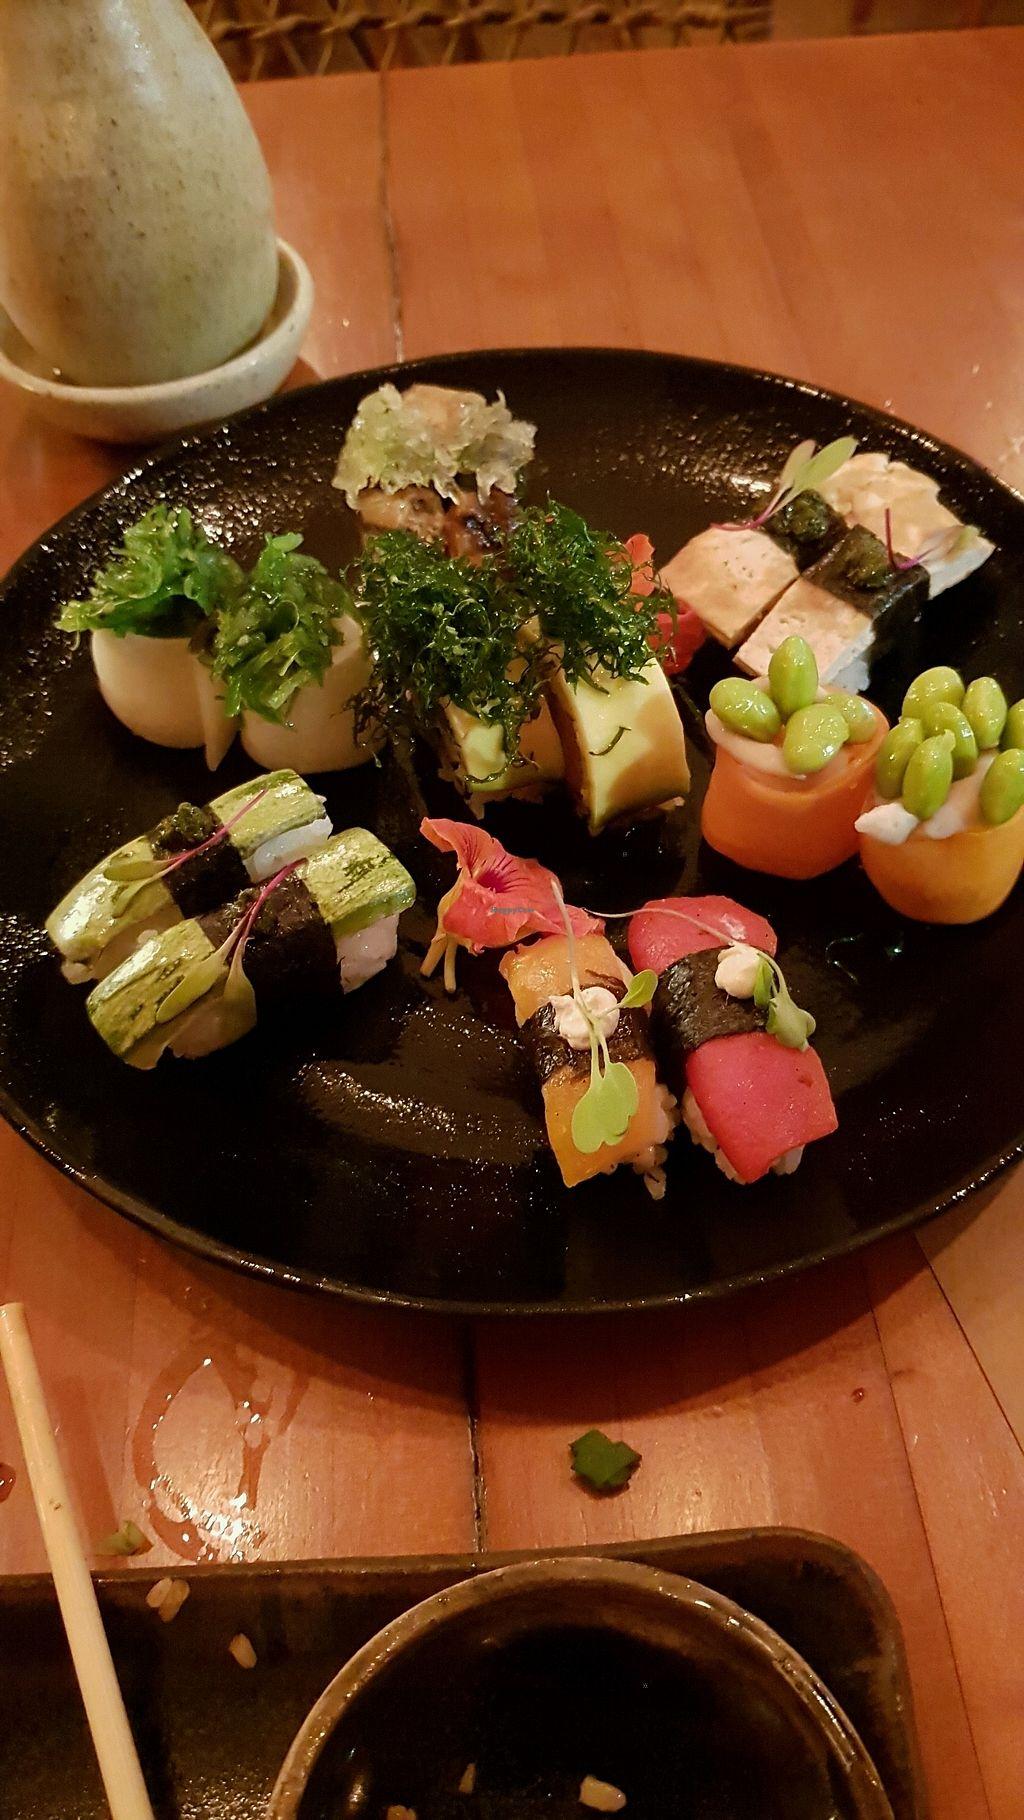 "Photo of Sushimar Vegano  by <a href=""/members/profile/tdelfim"">tdelfim</a> <br/>Prato de sushi no rodizio <br/> March 4, 2018  - <a href='/contact/abuse/image/106773/366603'>Report</a>"